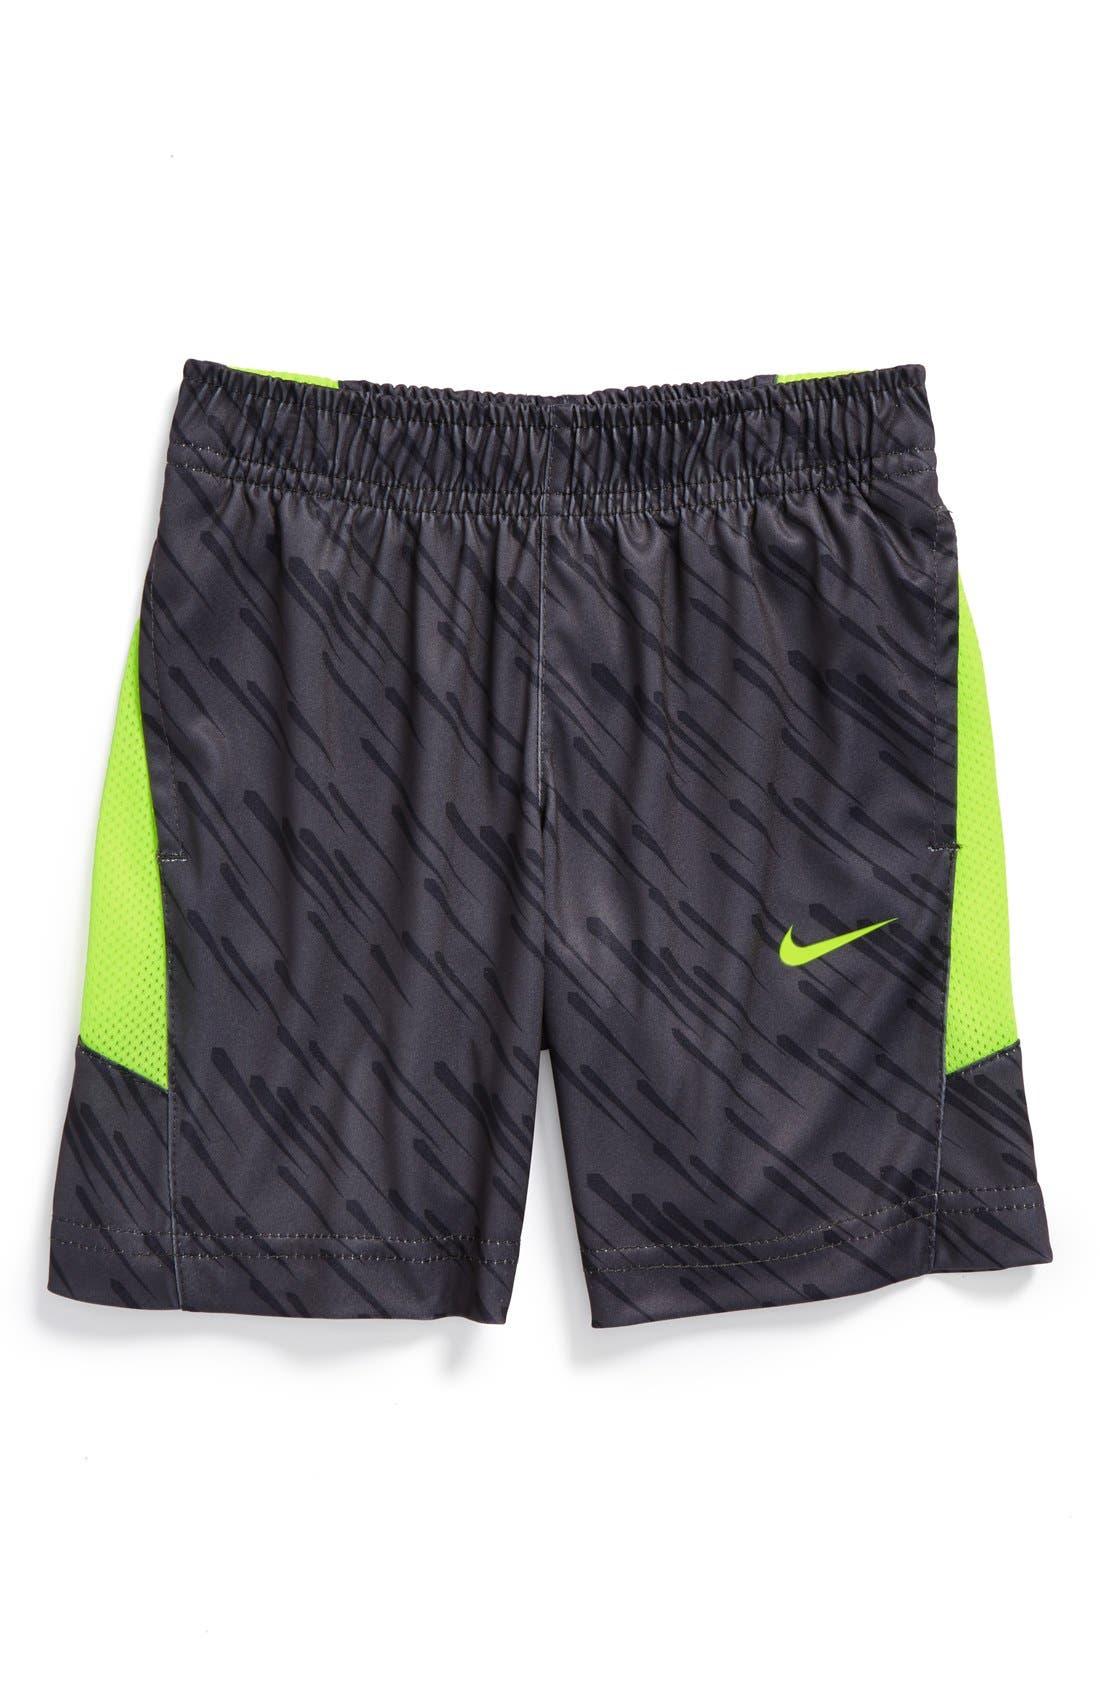 Main Image - Nike 'Speed GFX' Dri-FIT Shorts (Toddler Boys)